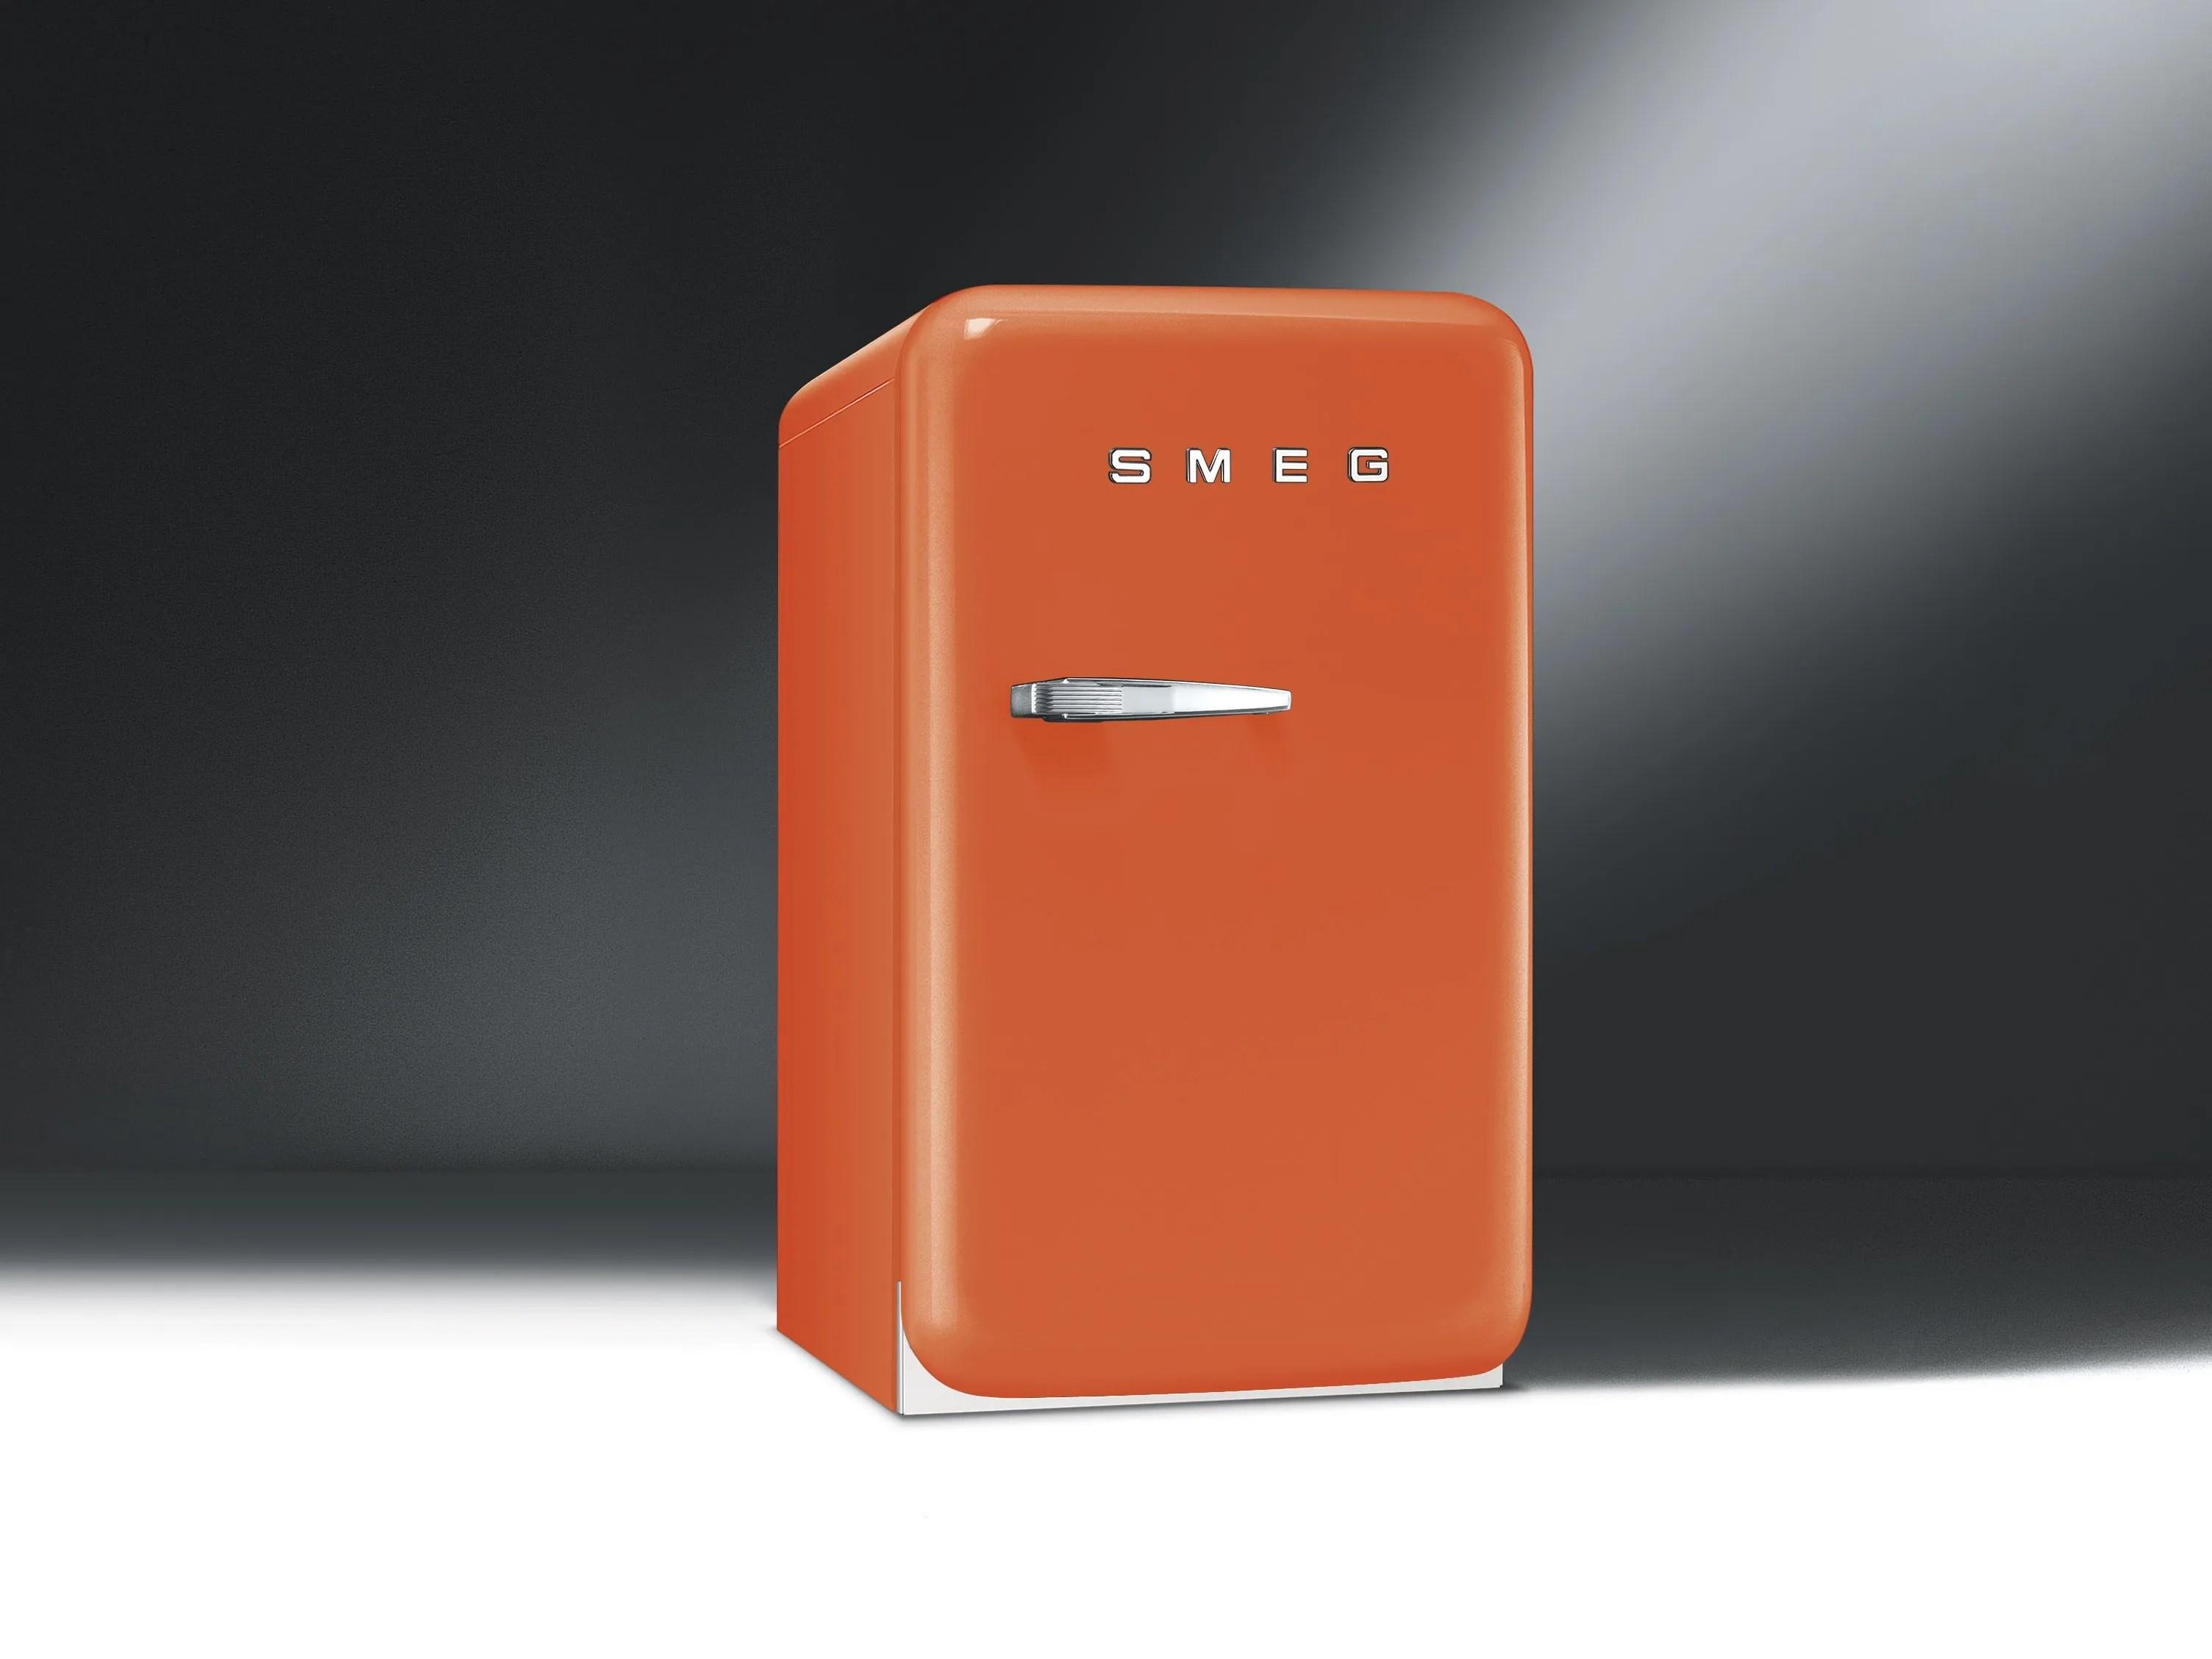 Mini Kühlschrank Dms : Mini kühlschrank design cubes cool cube mini kühlschrank rolling